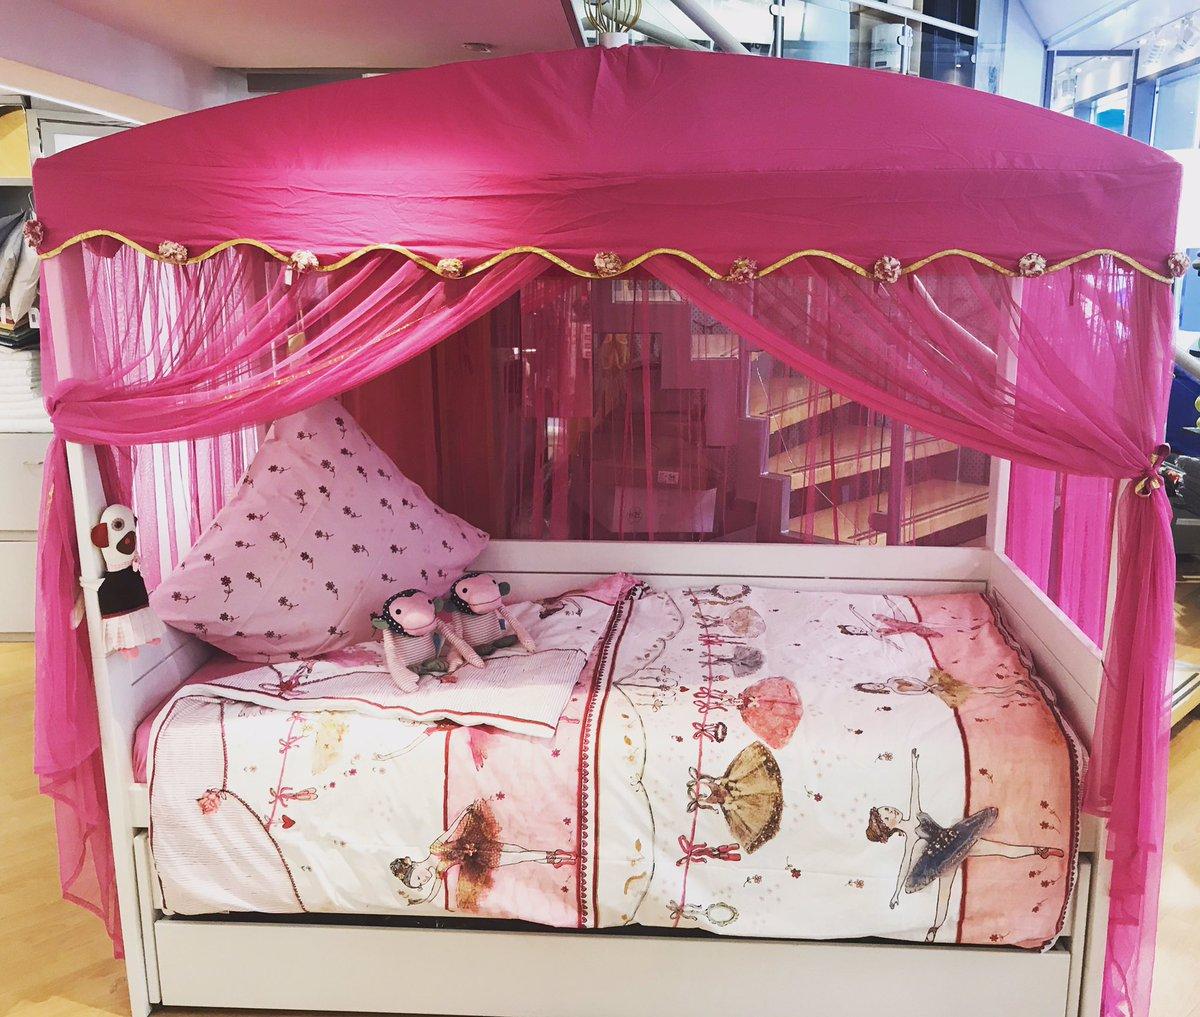 Full Size of Kinderzimmer Prinzessin Babyzimmer Komplett Playmobil Prinzessinnen Gestalten Gebraucht Deko 6852   Prinzessinnen Kinderzimmer Karolin Pinolino Lillifee Kinderzimmer Kinderzimmer Prinzessin